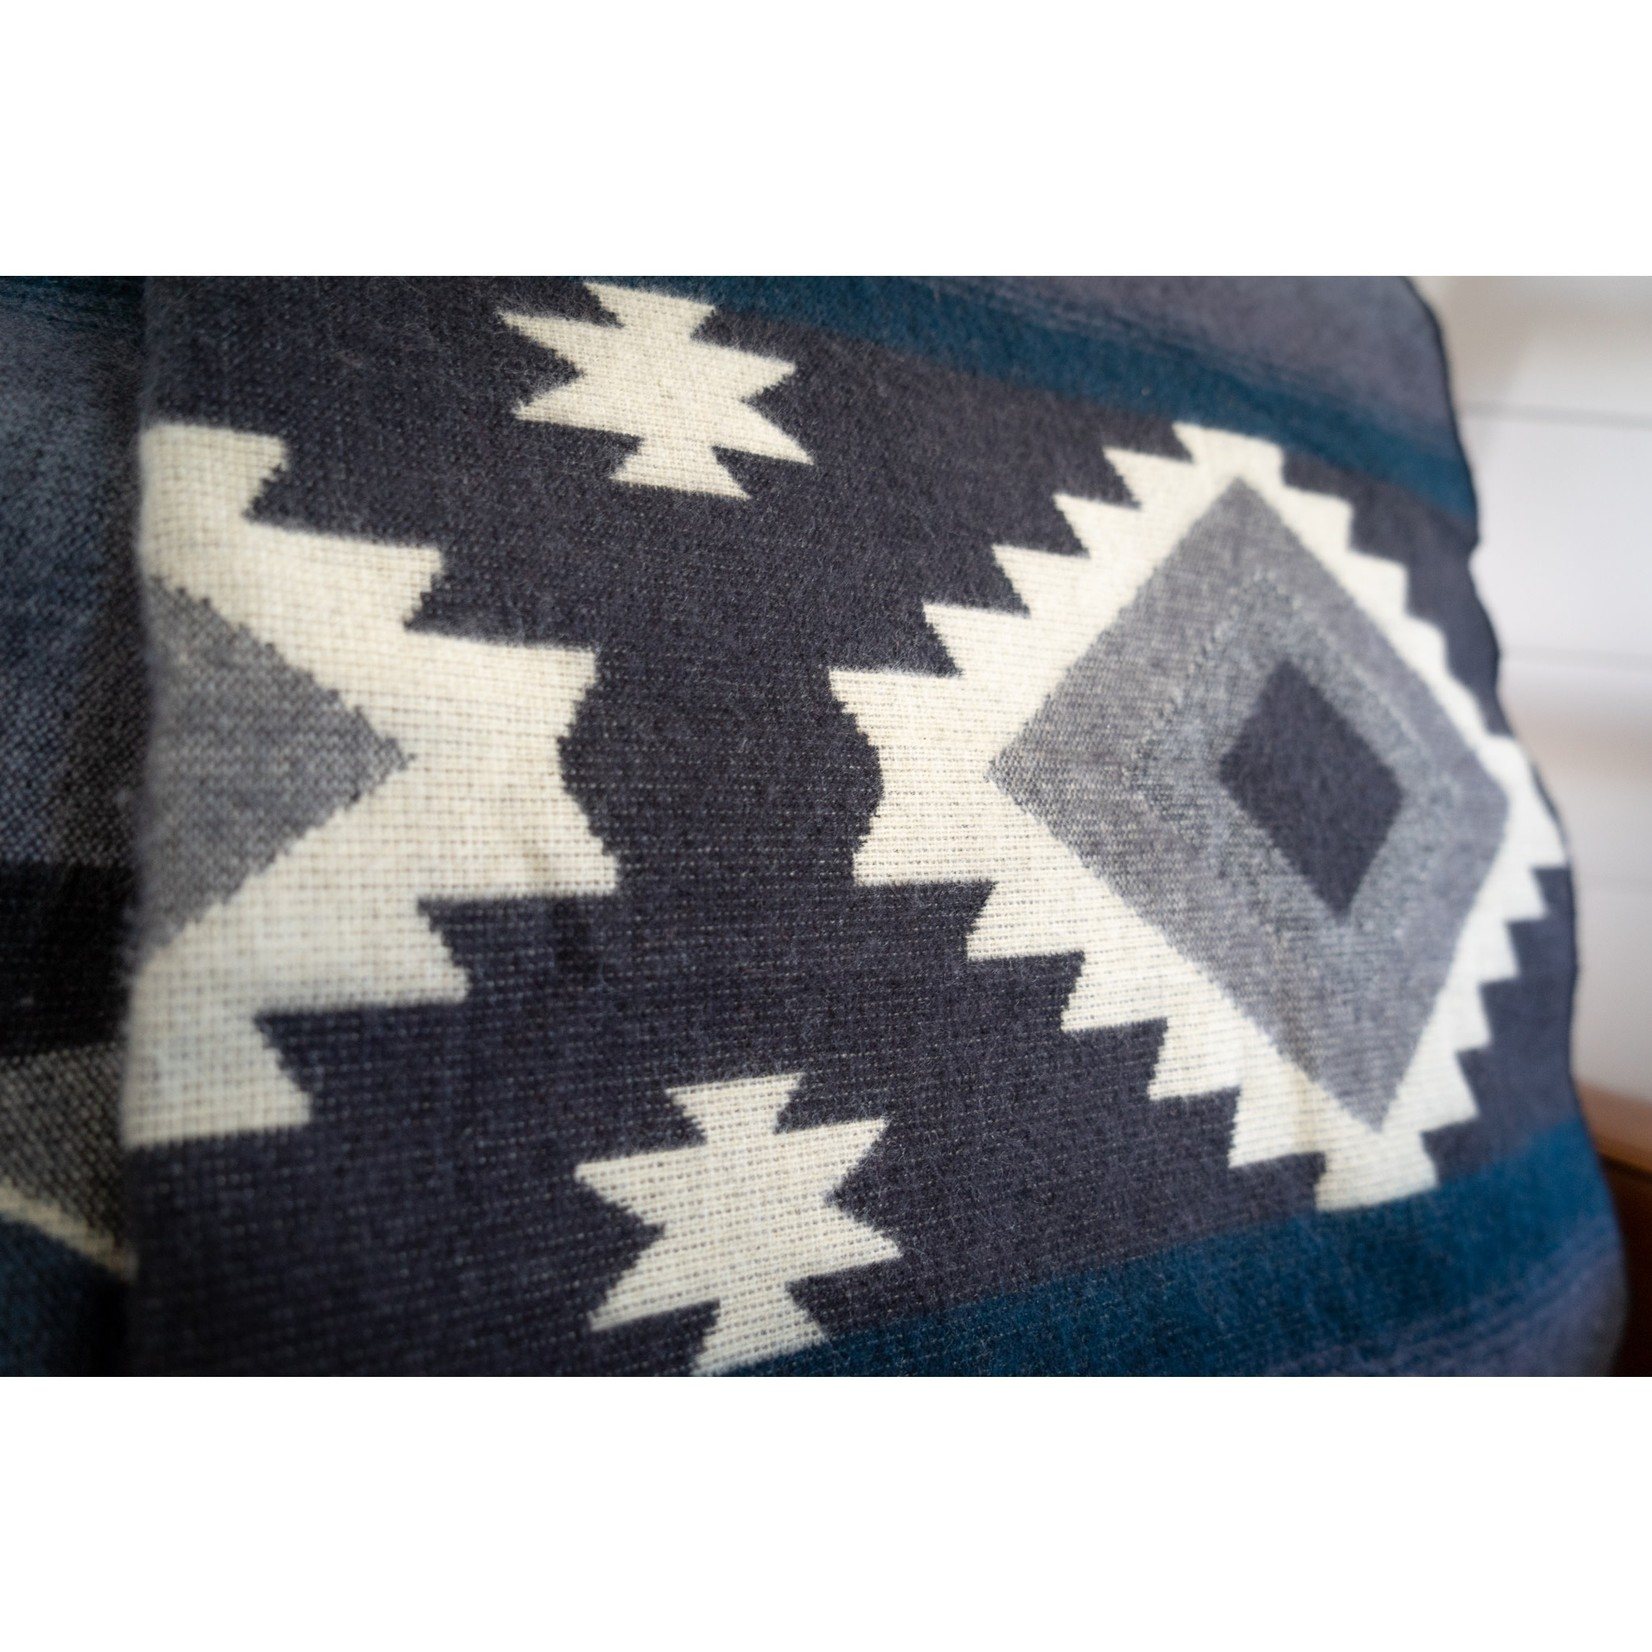 Alpaca Threadz Alpaca Threadz Andean Alpaca Wool Blanket - Midnight